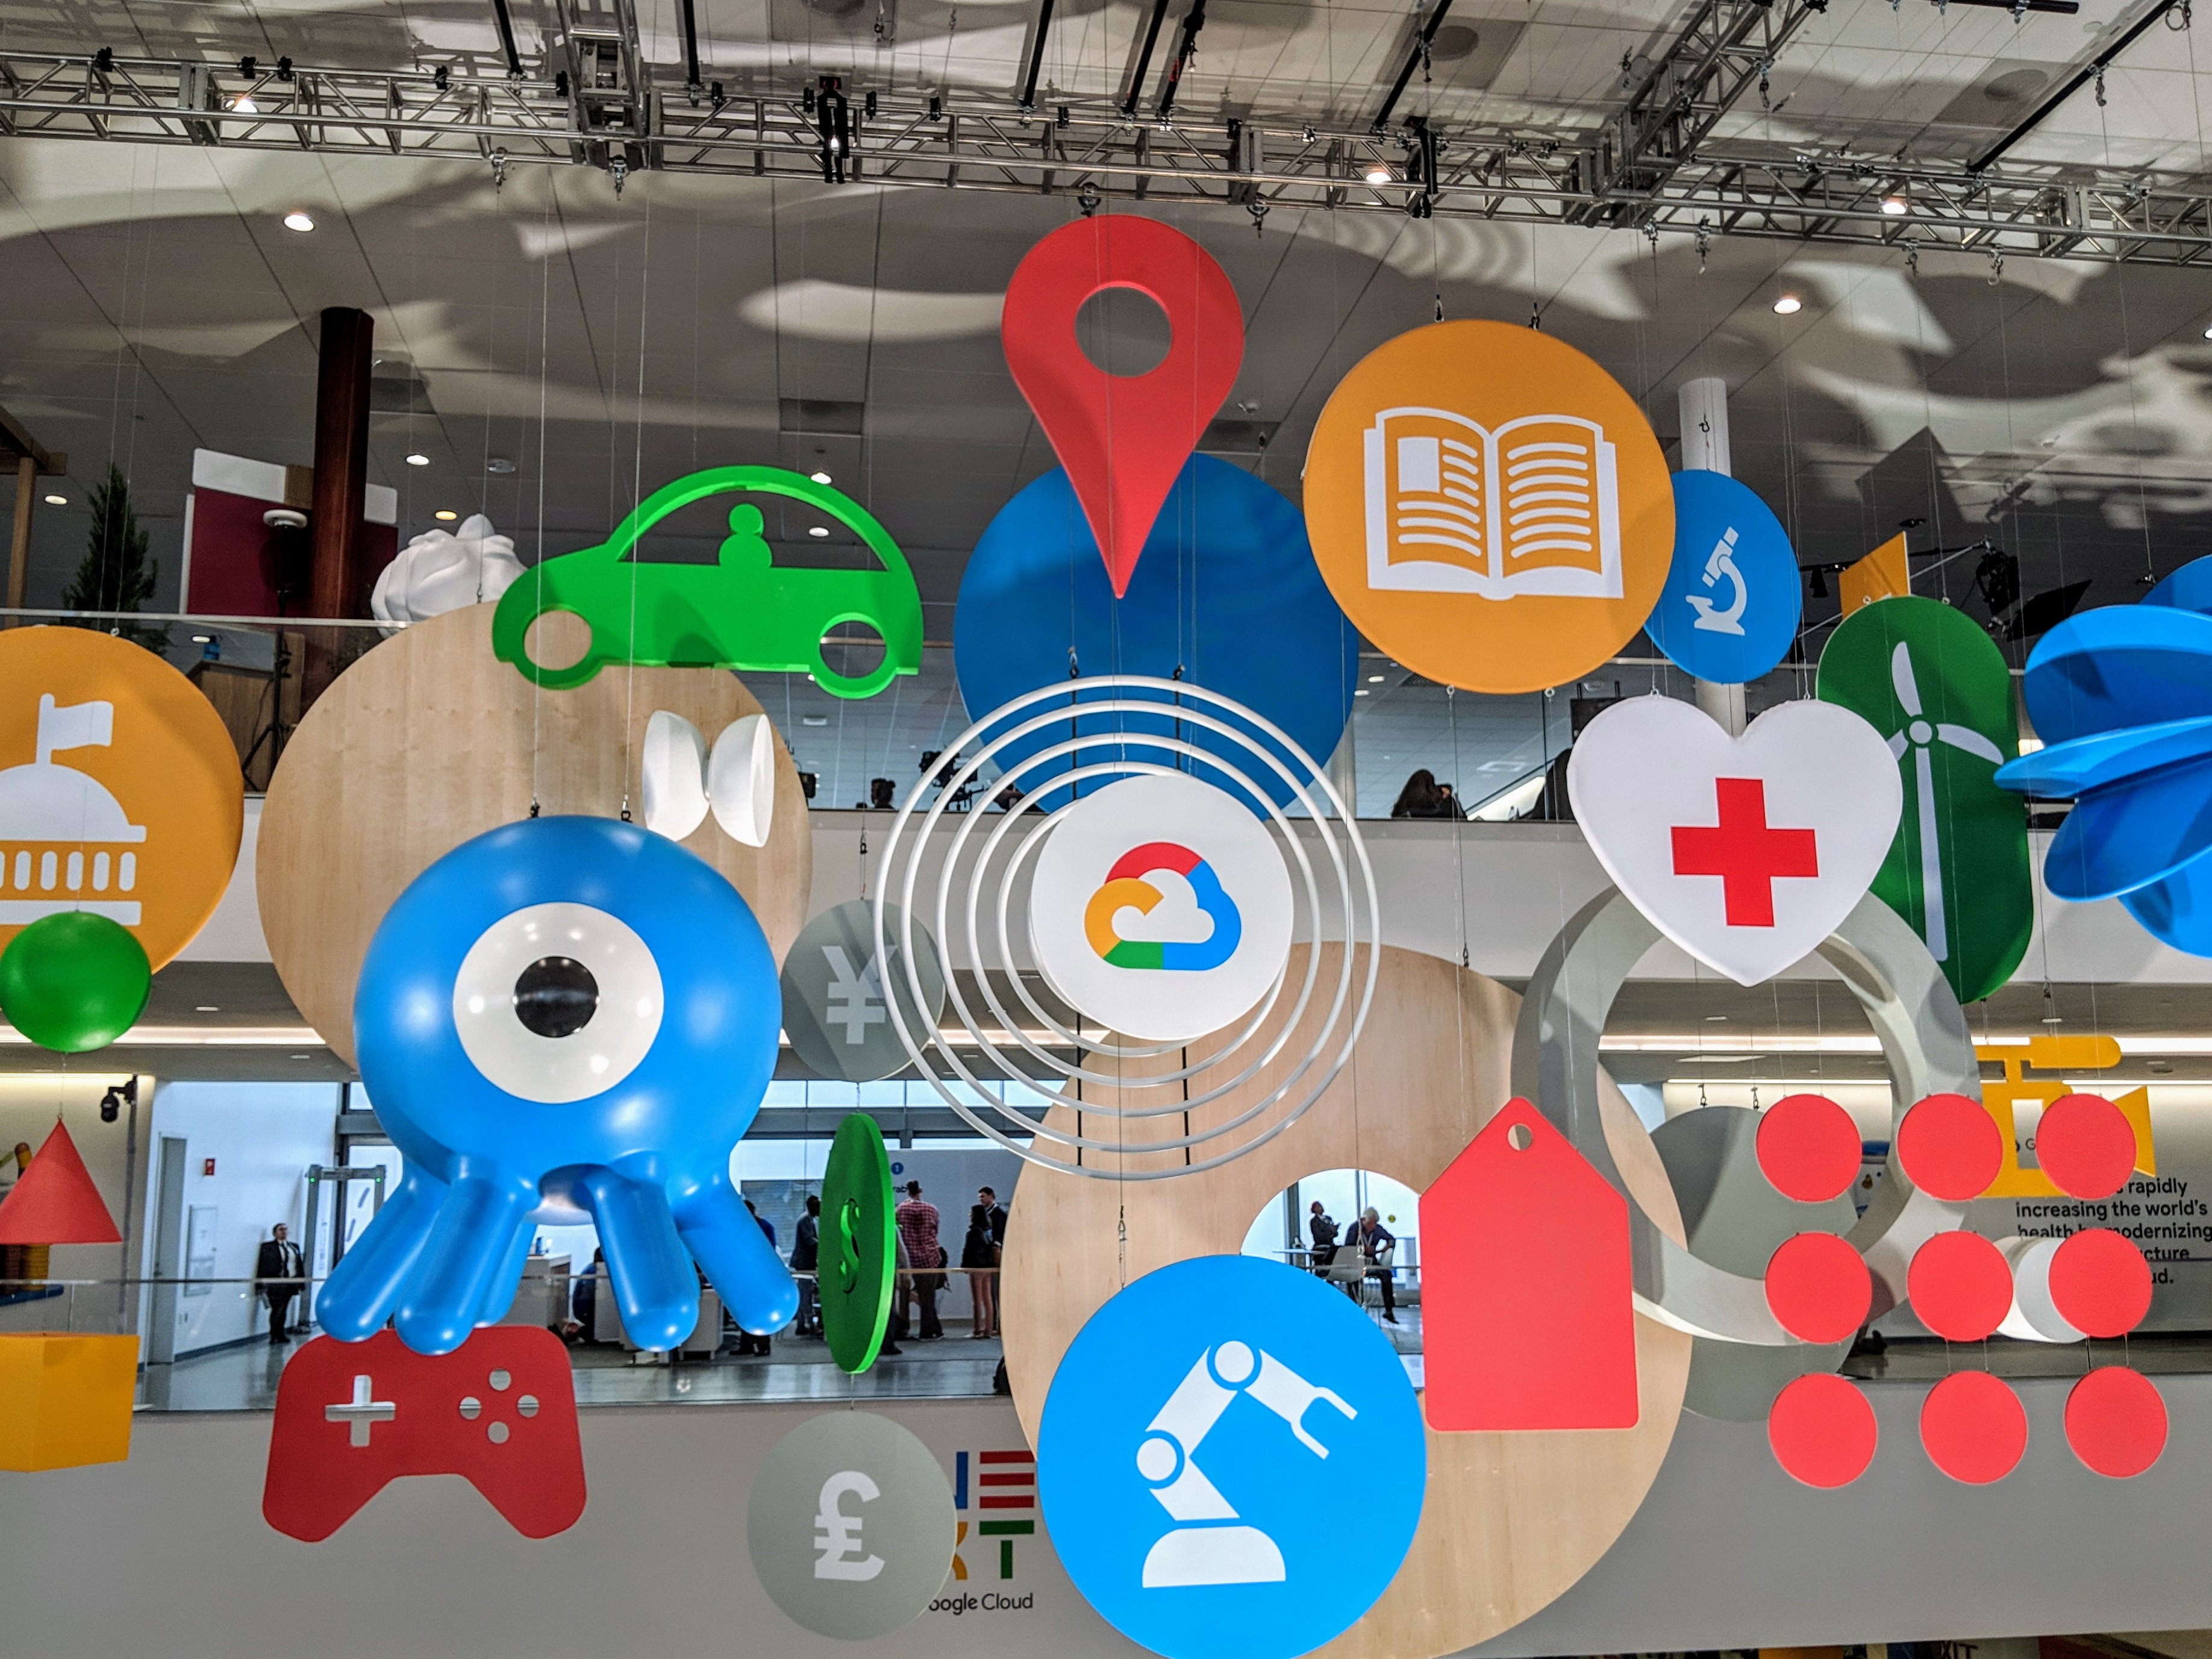 Thomas Kurian On His First Year As Google Cloud CEO